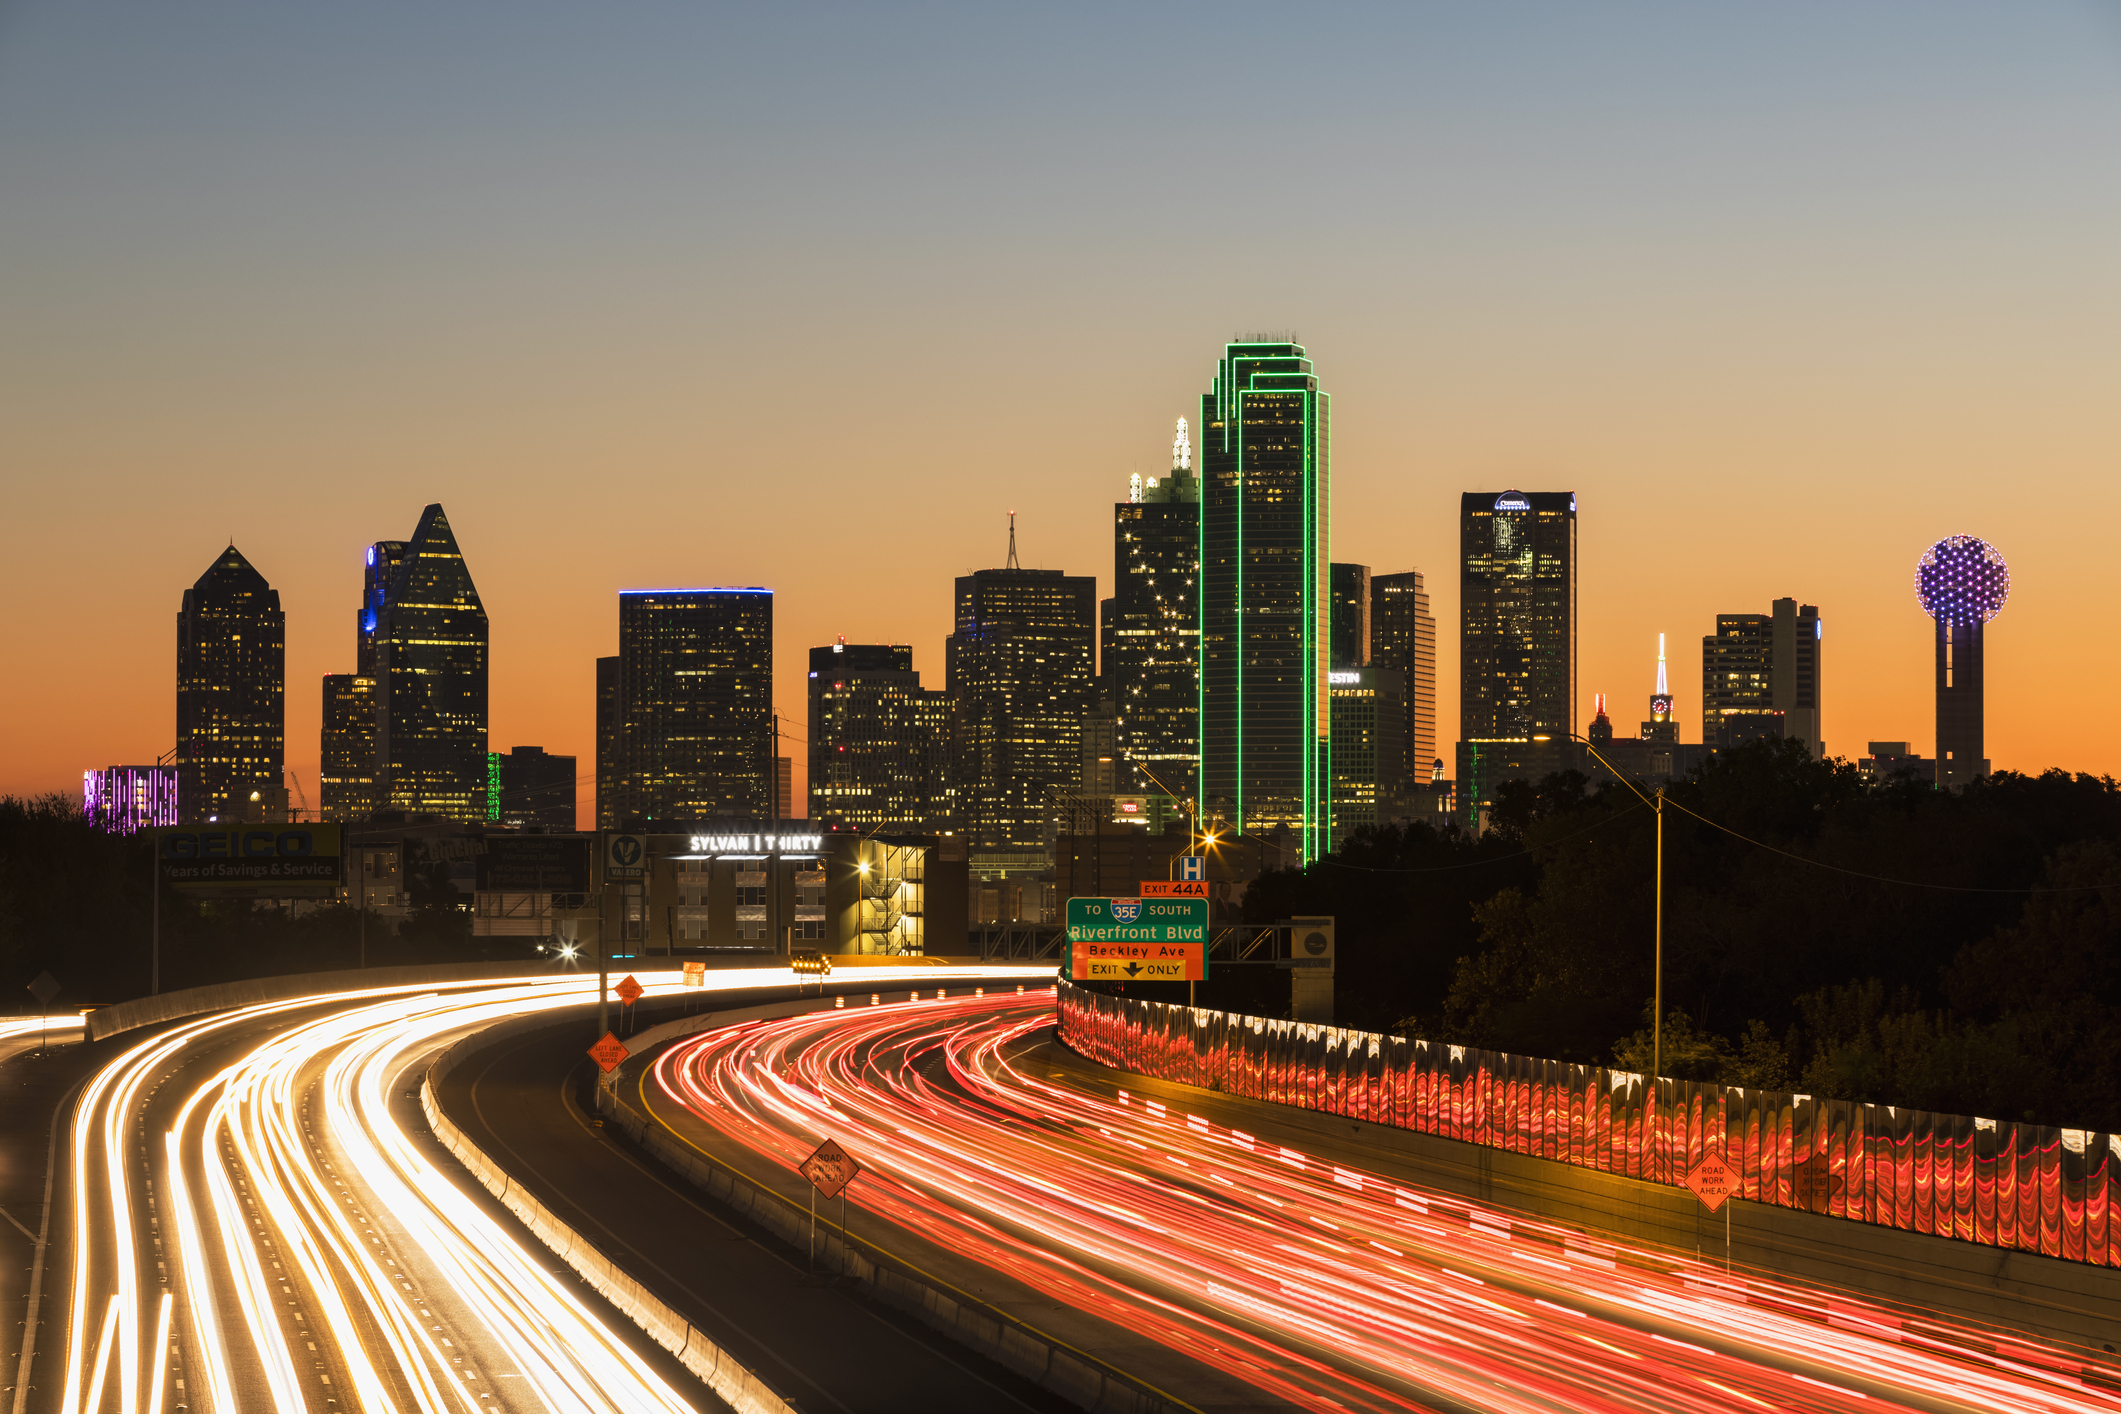 USA, Texas, Dallas, skyline and Tom Landry Freeway, Interstate 30 at night